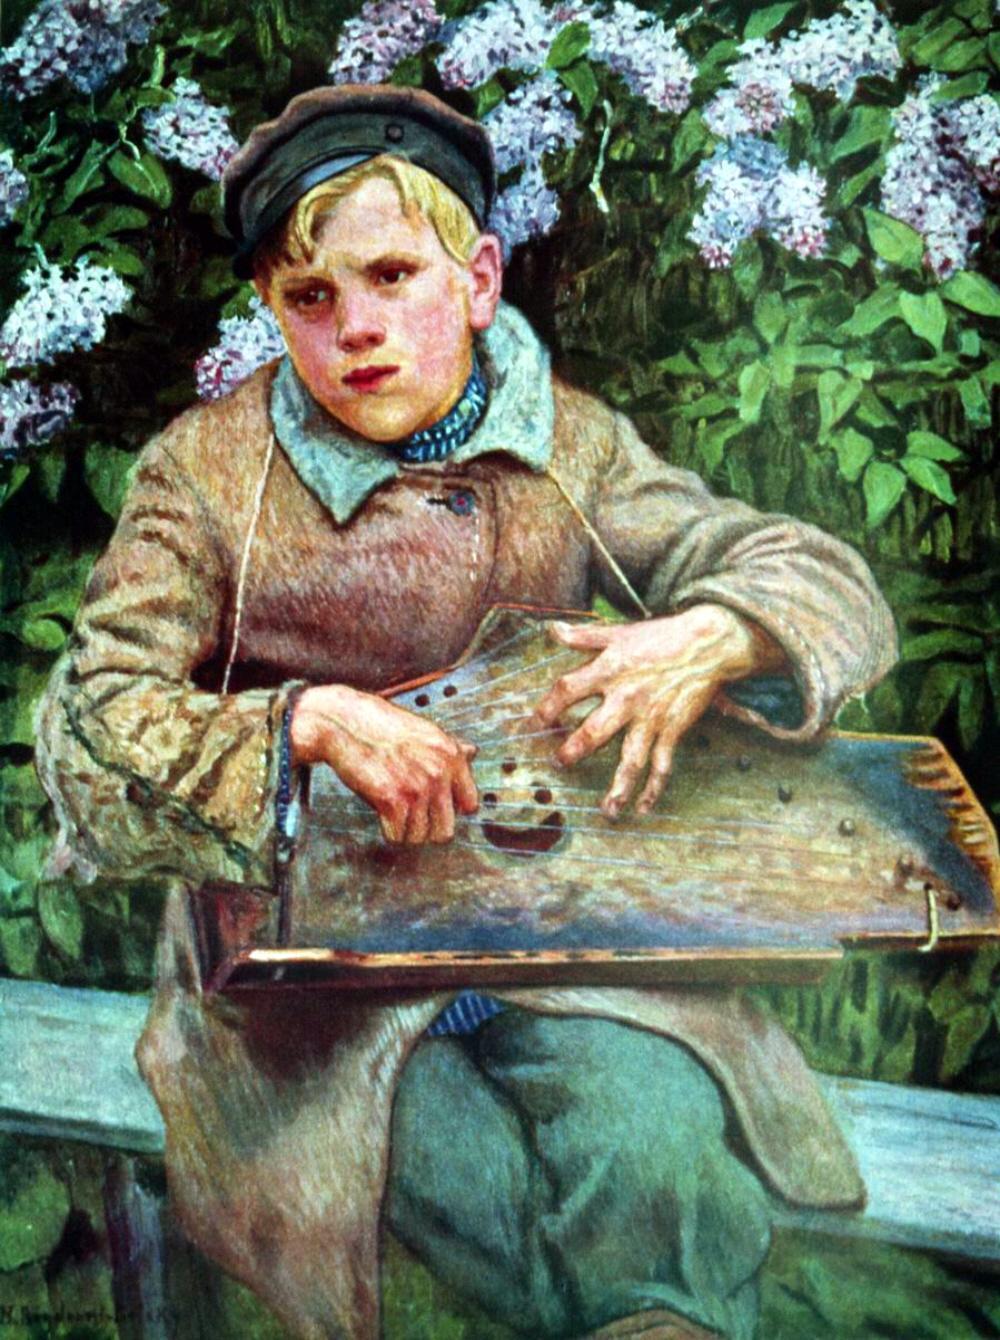 Nikolai Bogdanov-Belsky. A Young Musician. 1920s